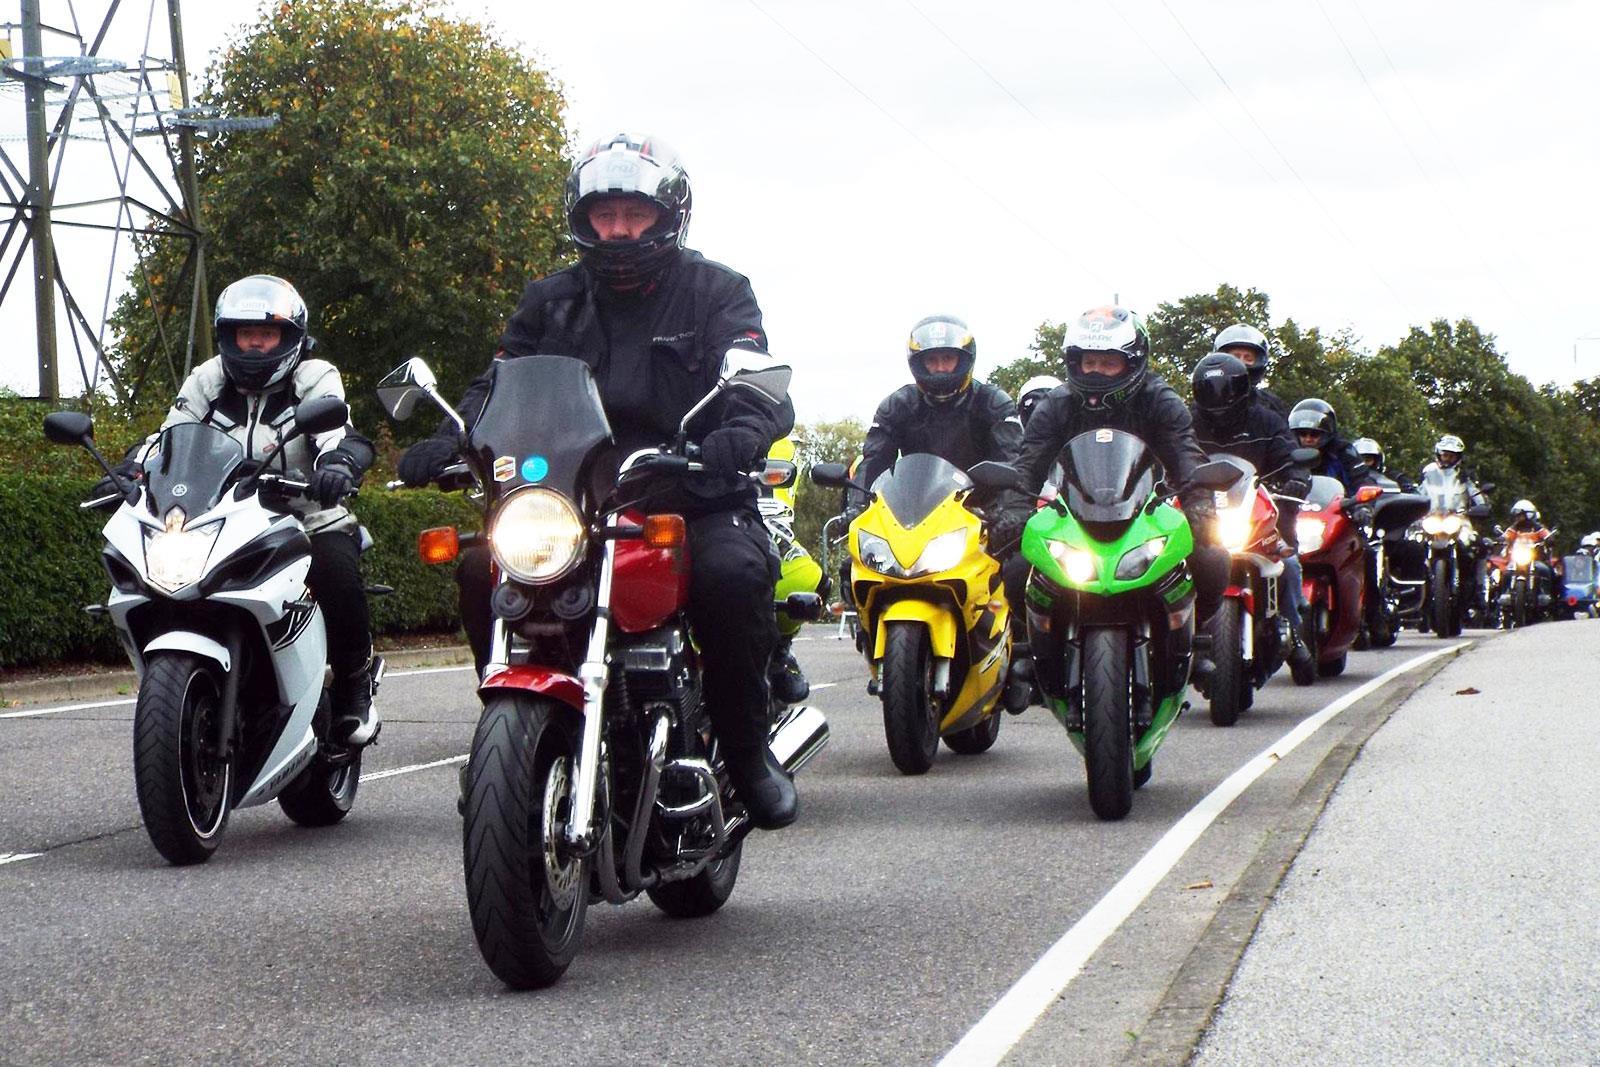 ride bikers ambulance air ehaat essex gather massive harwich dunton mcn